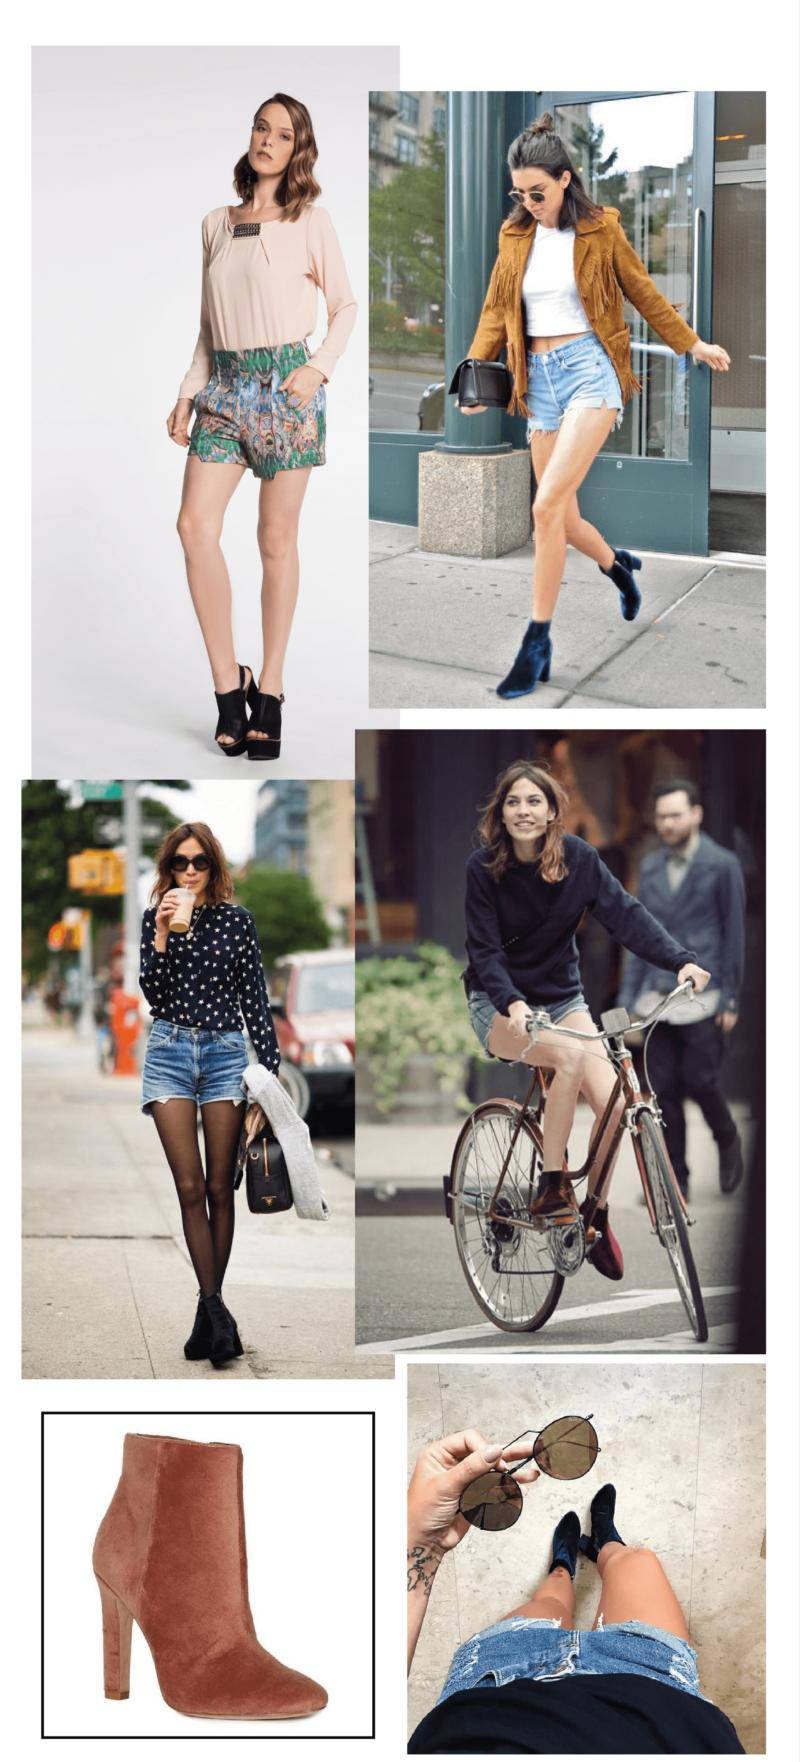 Amey-tendencia-Akle-Boots-Veludo-Shorts